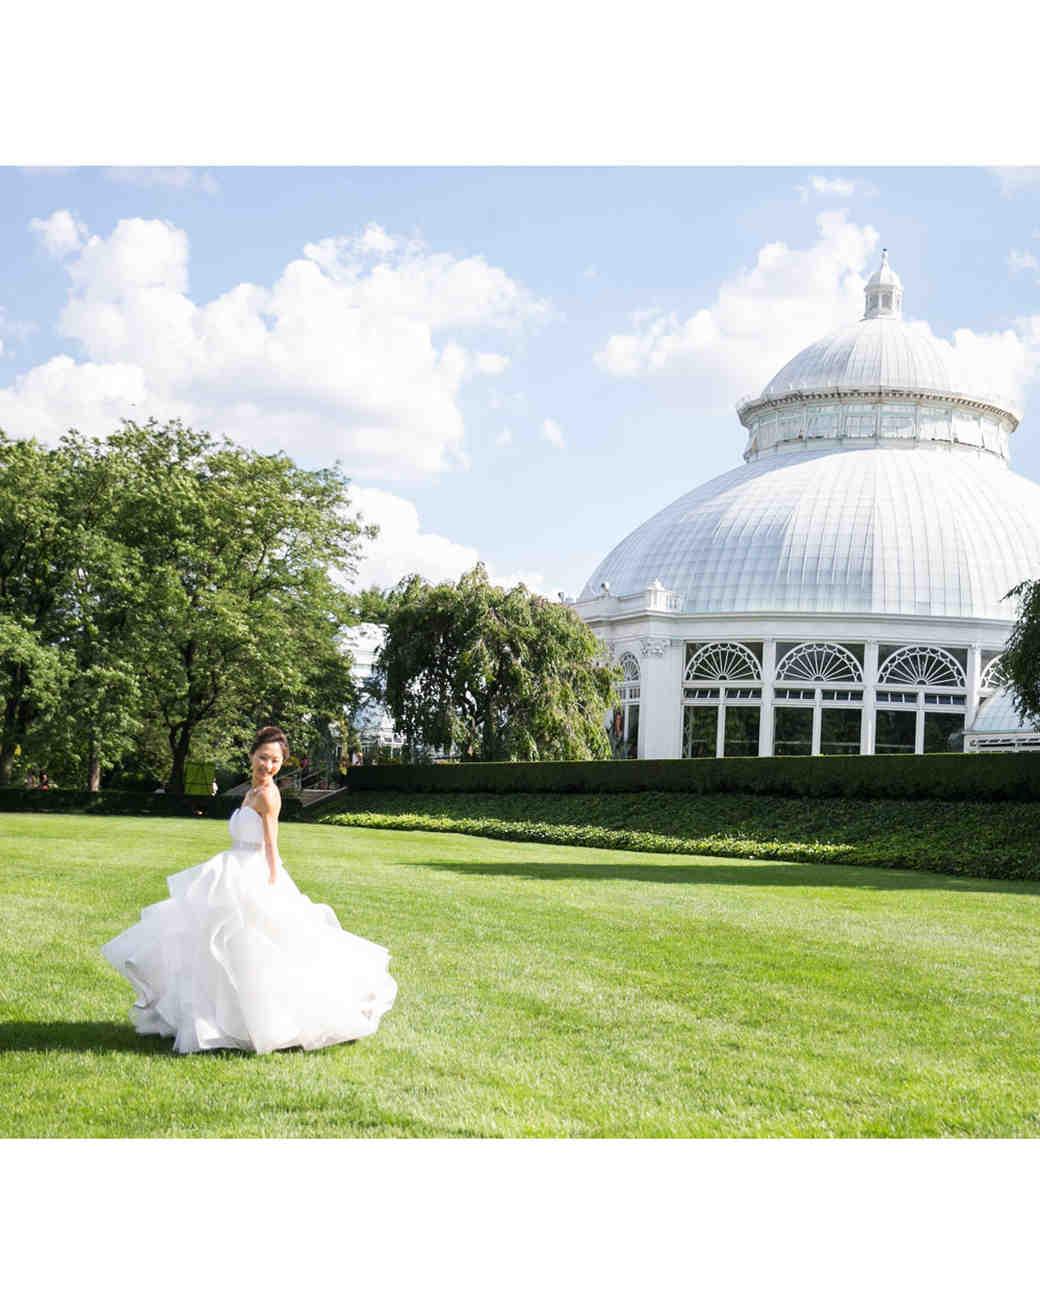 wedding-day-photography-tips-6-0216.jpg